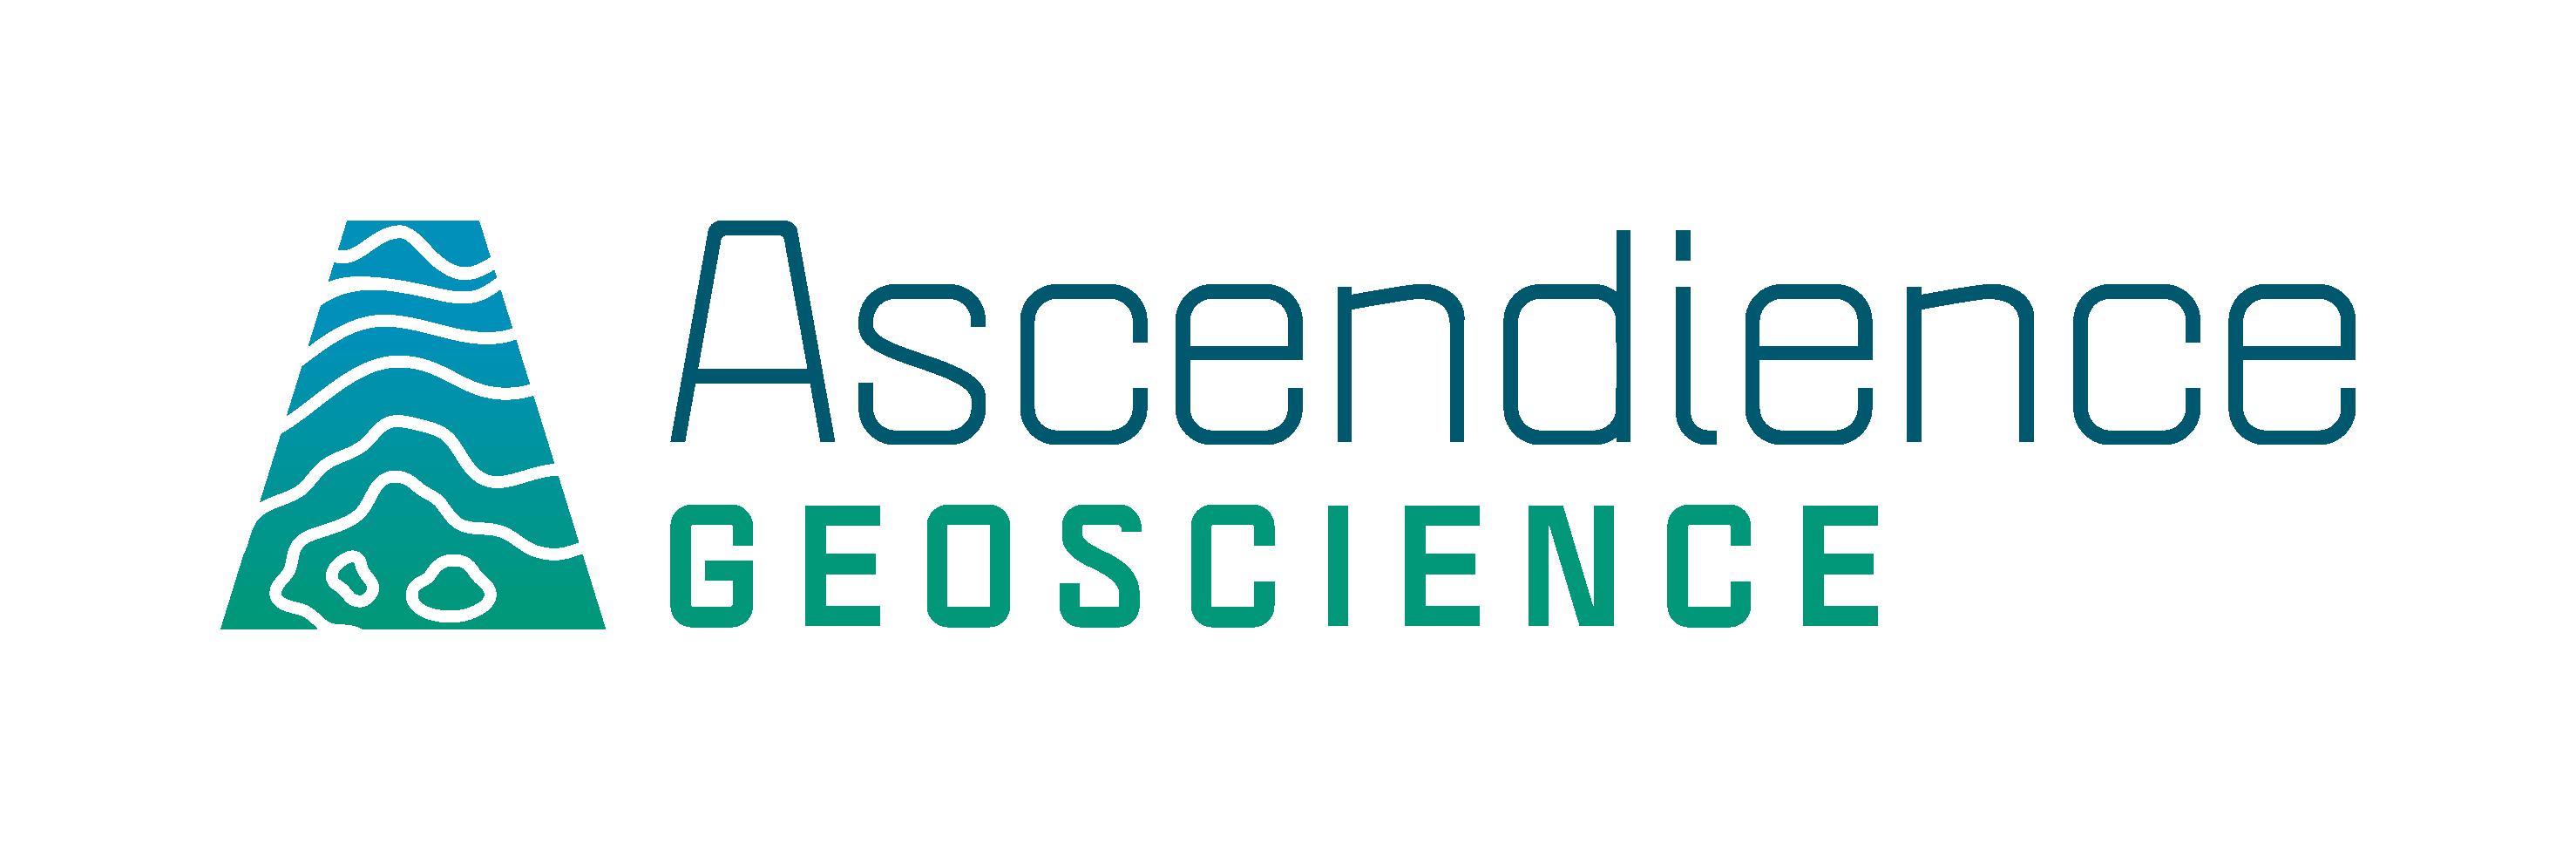 Ascendience Geoscience Logo